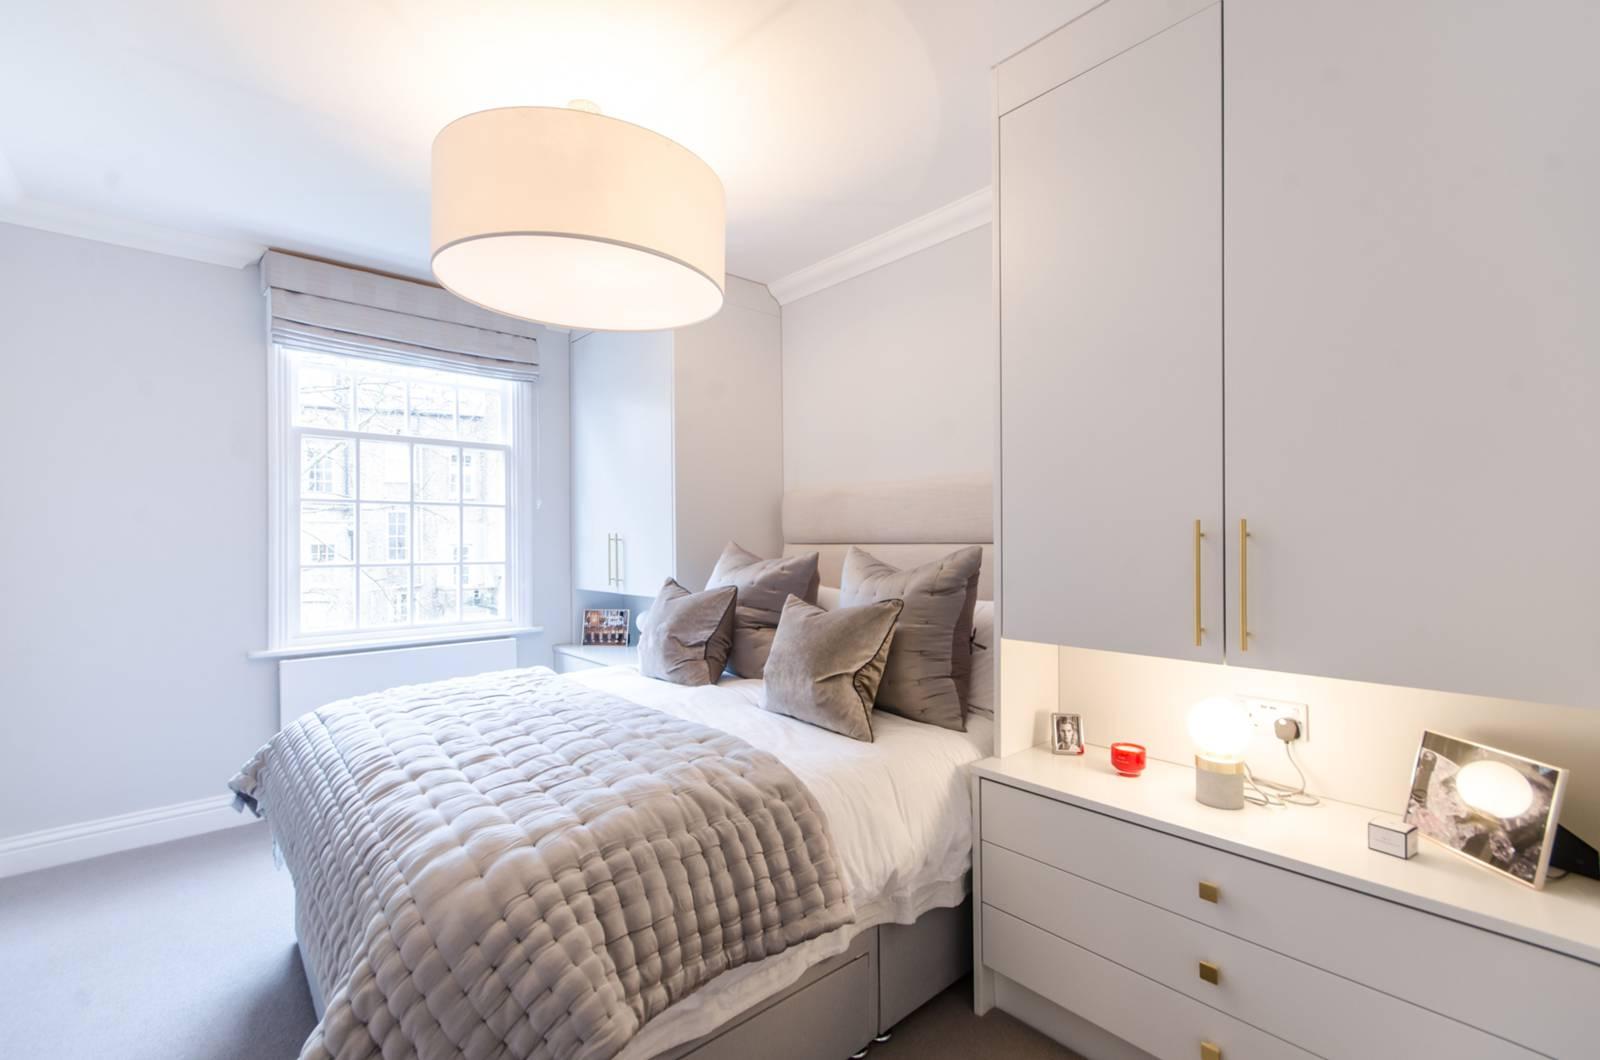 Appartamenti Vendita Londra Notting Hill